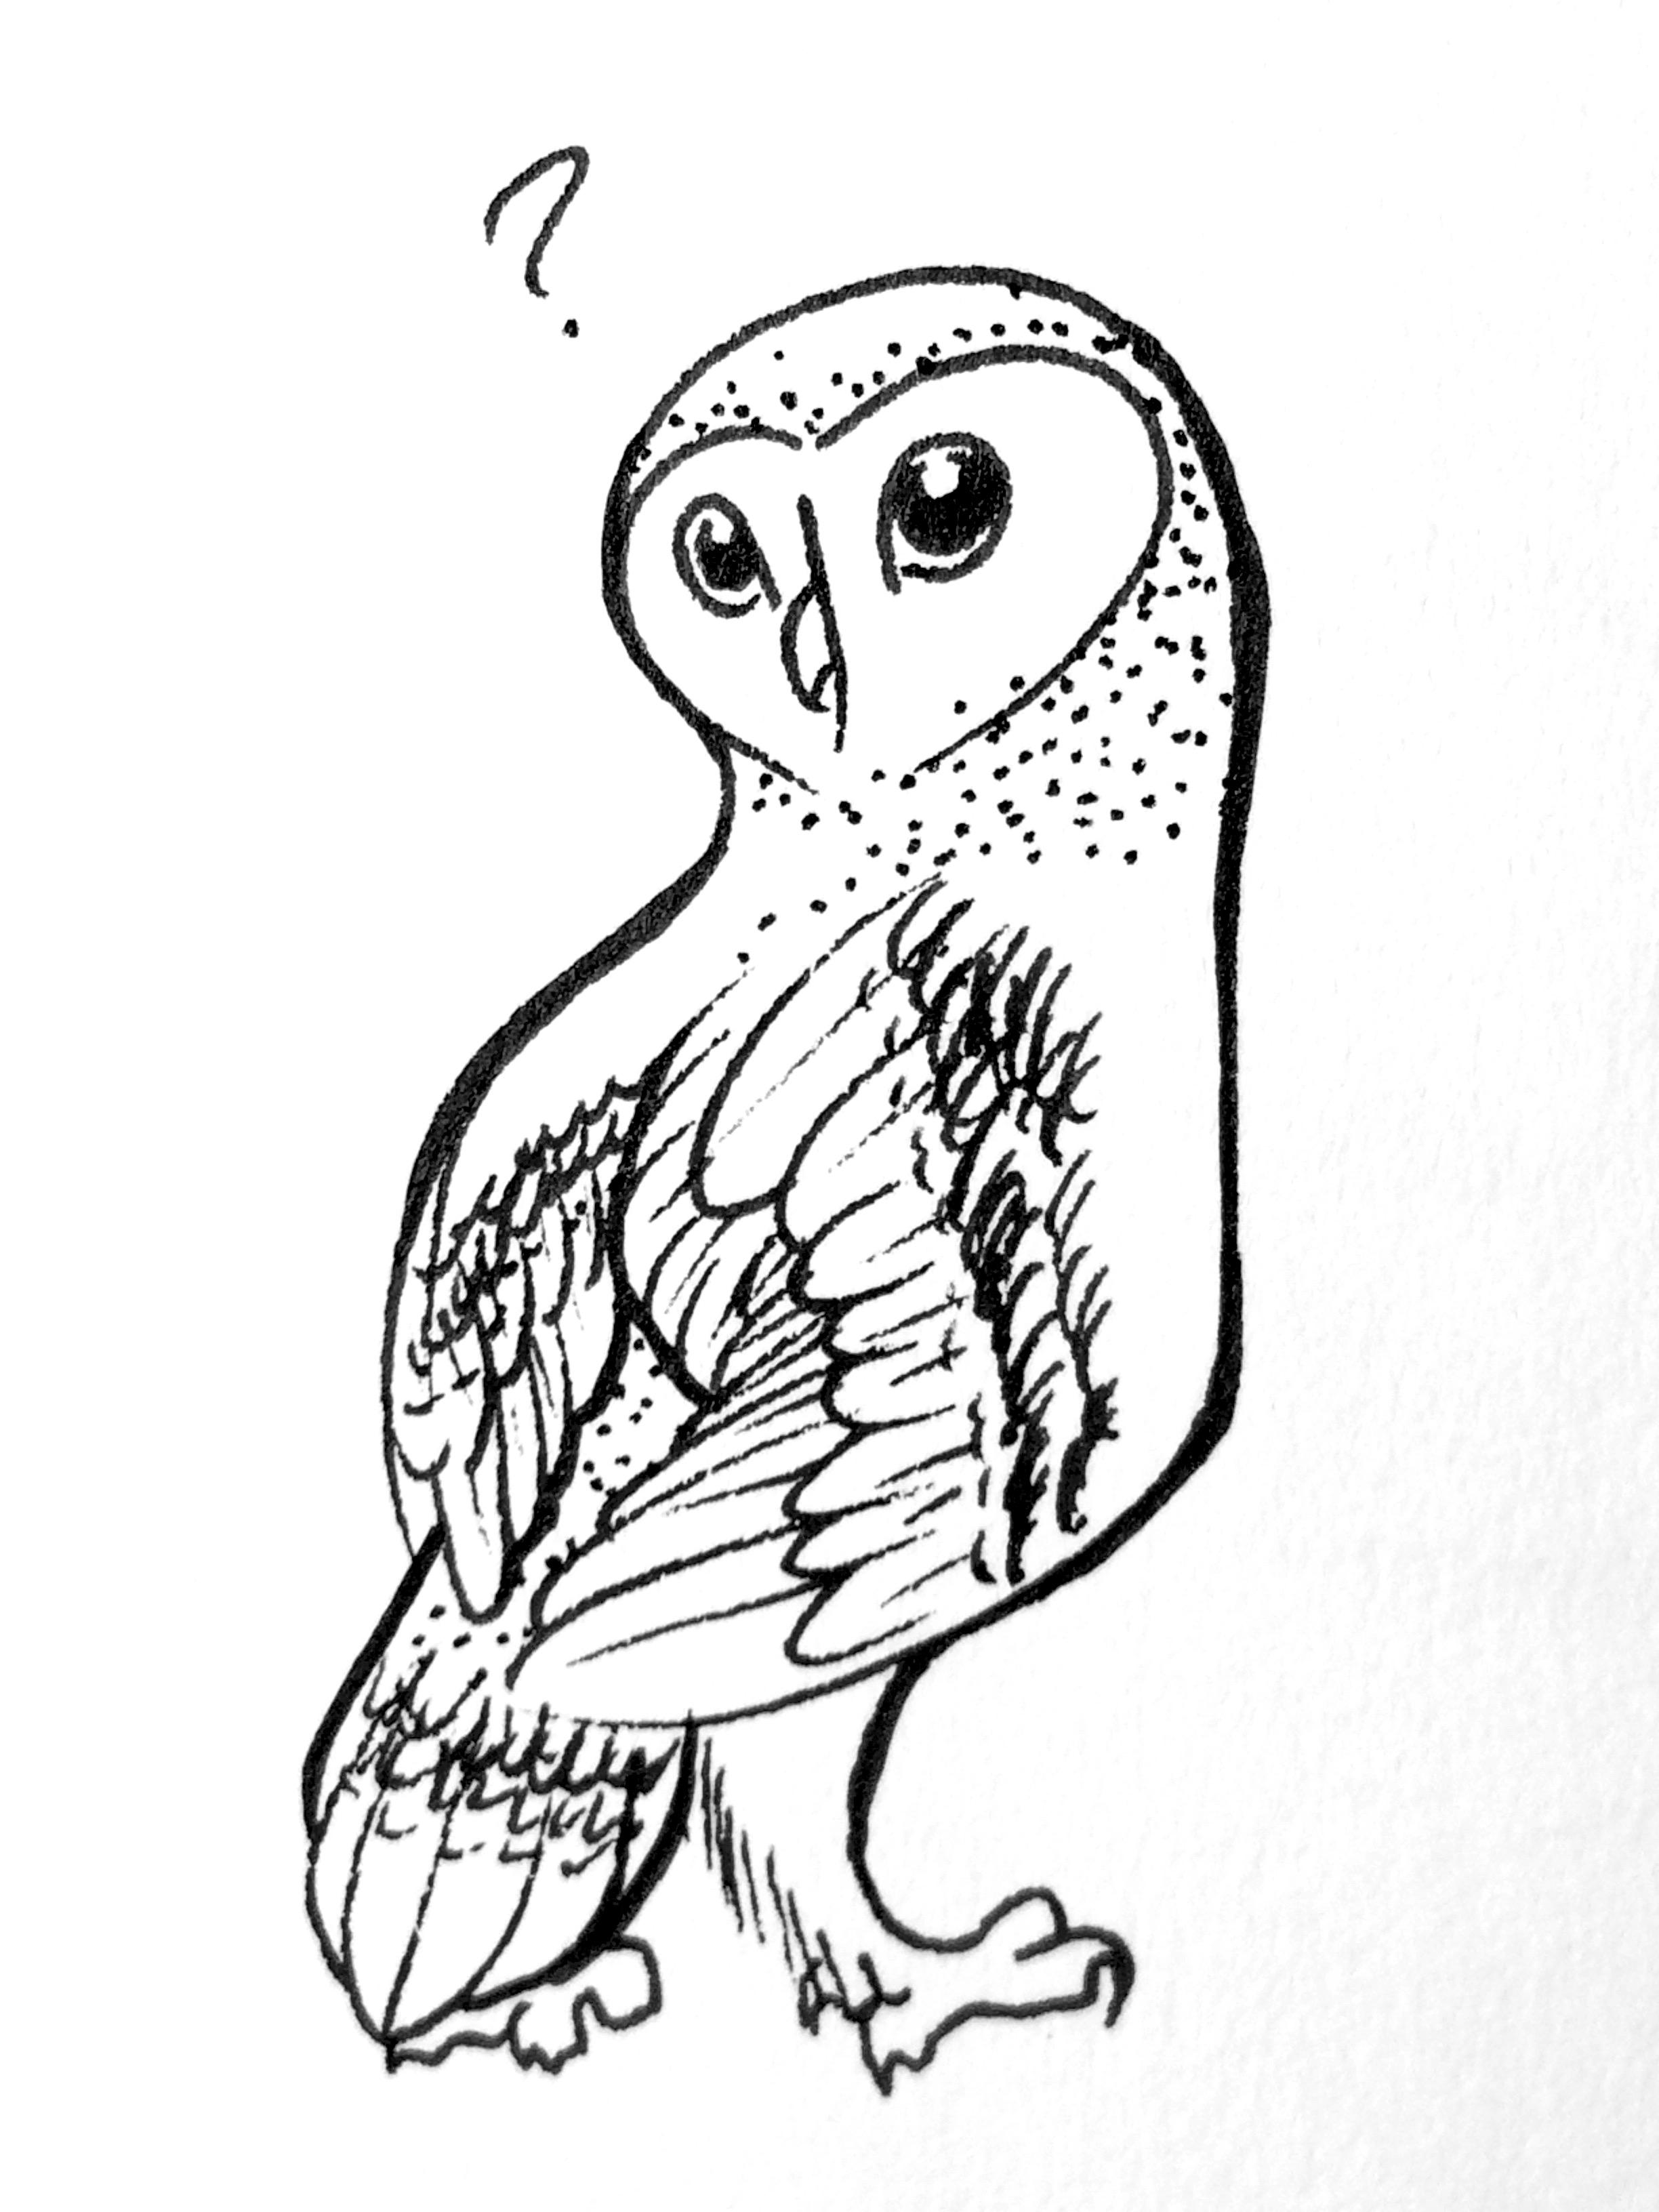 2448x3264 Drawn By @kawaiibakemono